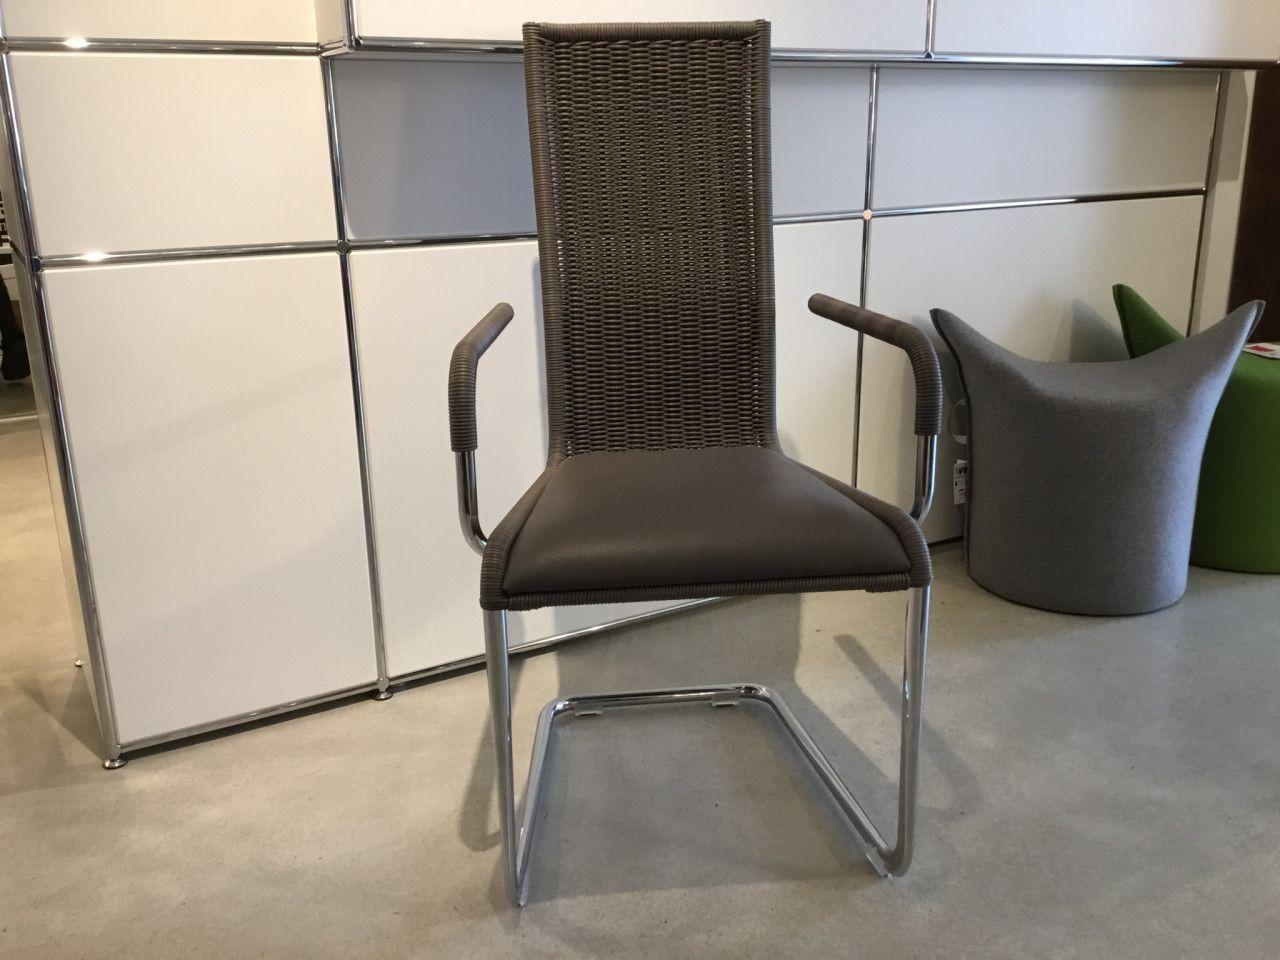 tecta d 28 i | designermöbel ravensburg | haus deko